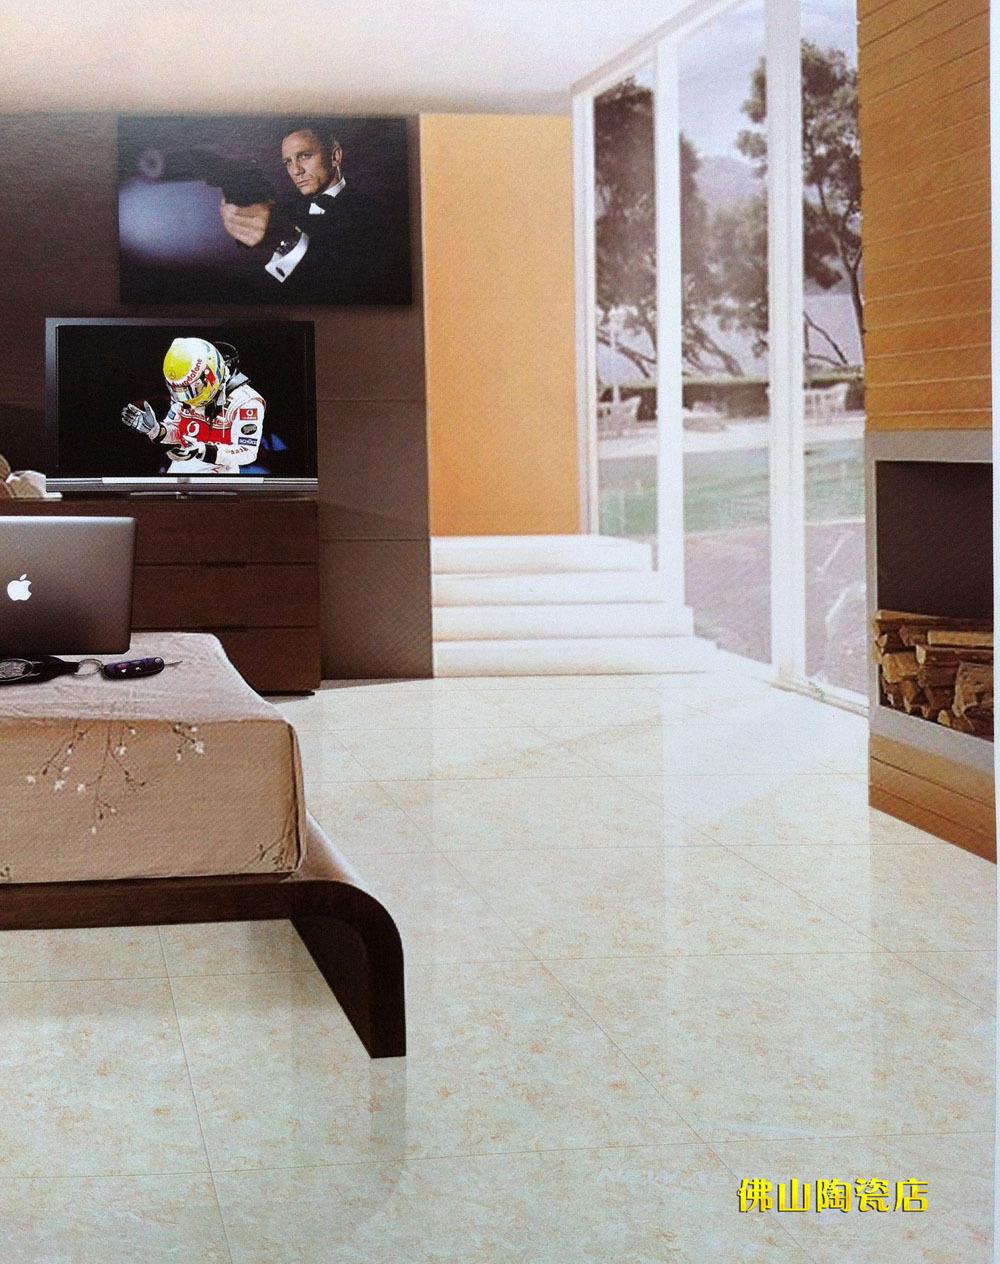 Ceramic polishing brick indoor tile floor tiles glassified b32602 /WHOLESALE discount ADJUST Shipping(China (Mainland))